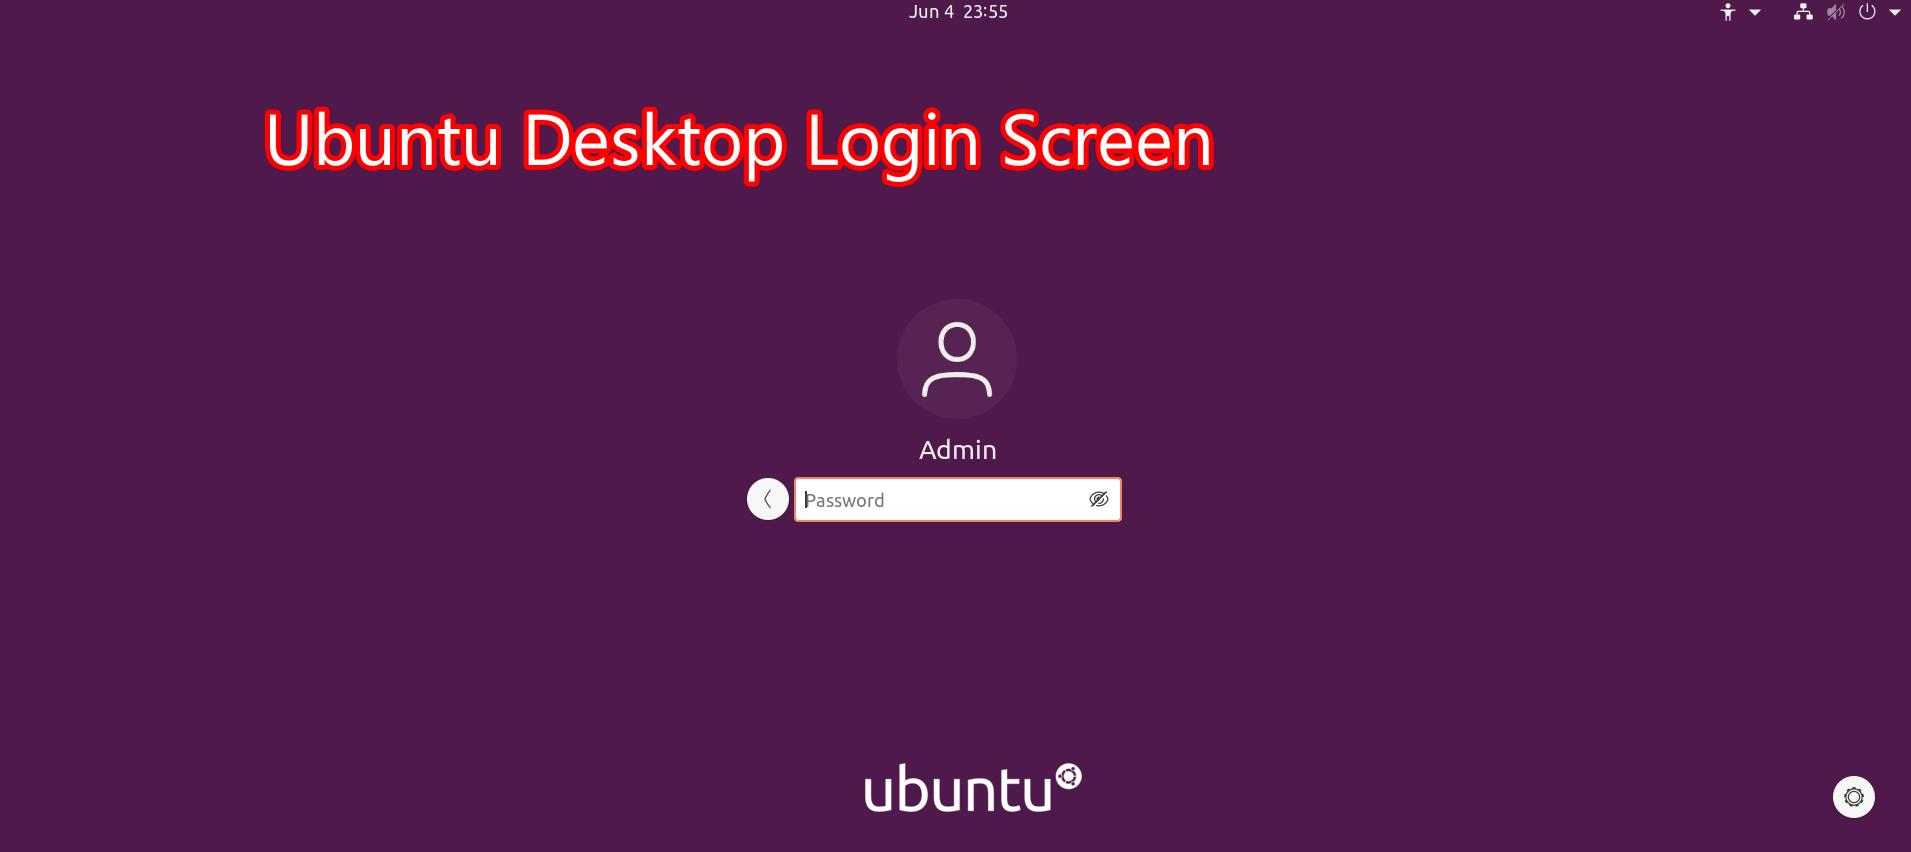 Ubuntu Login Screen